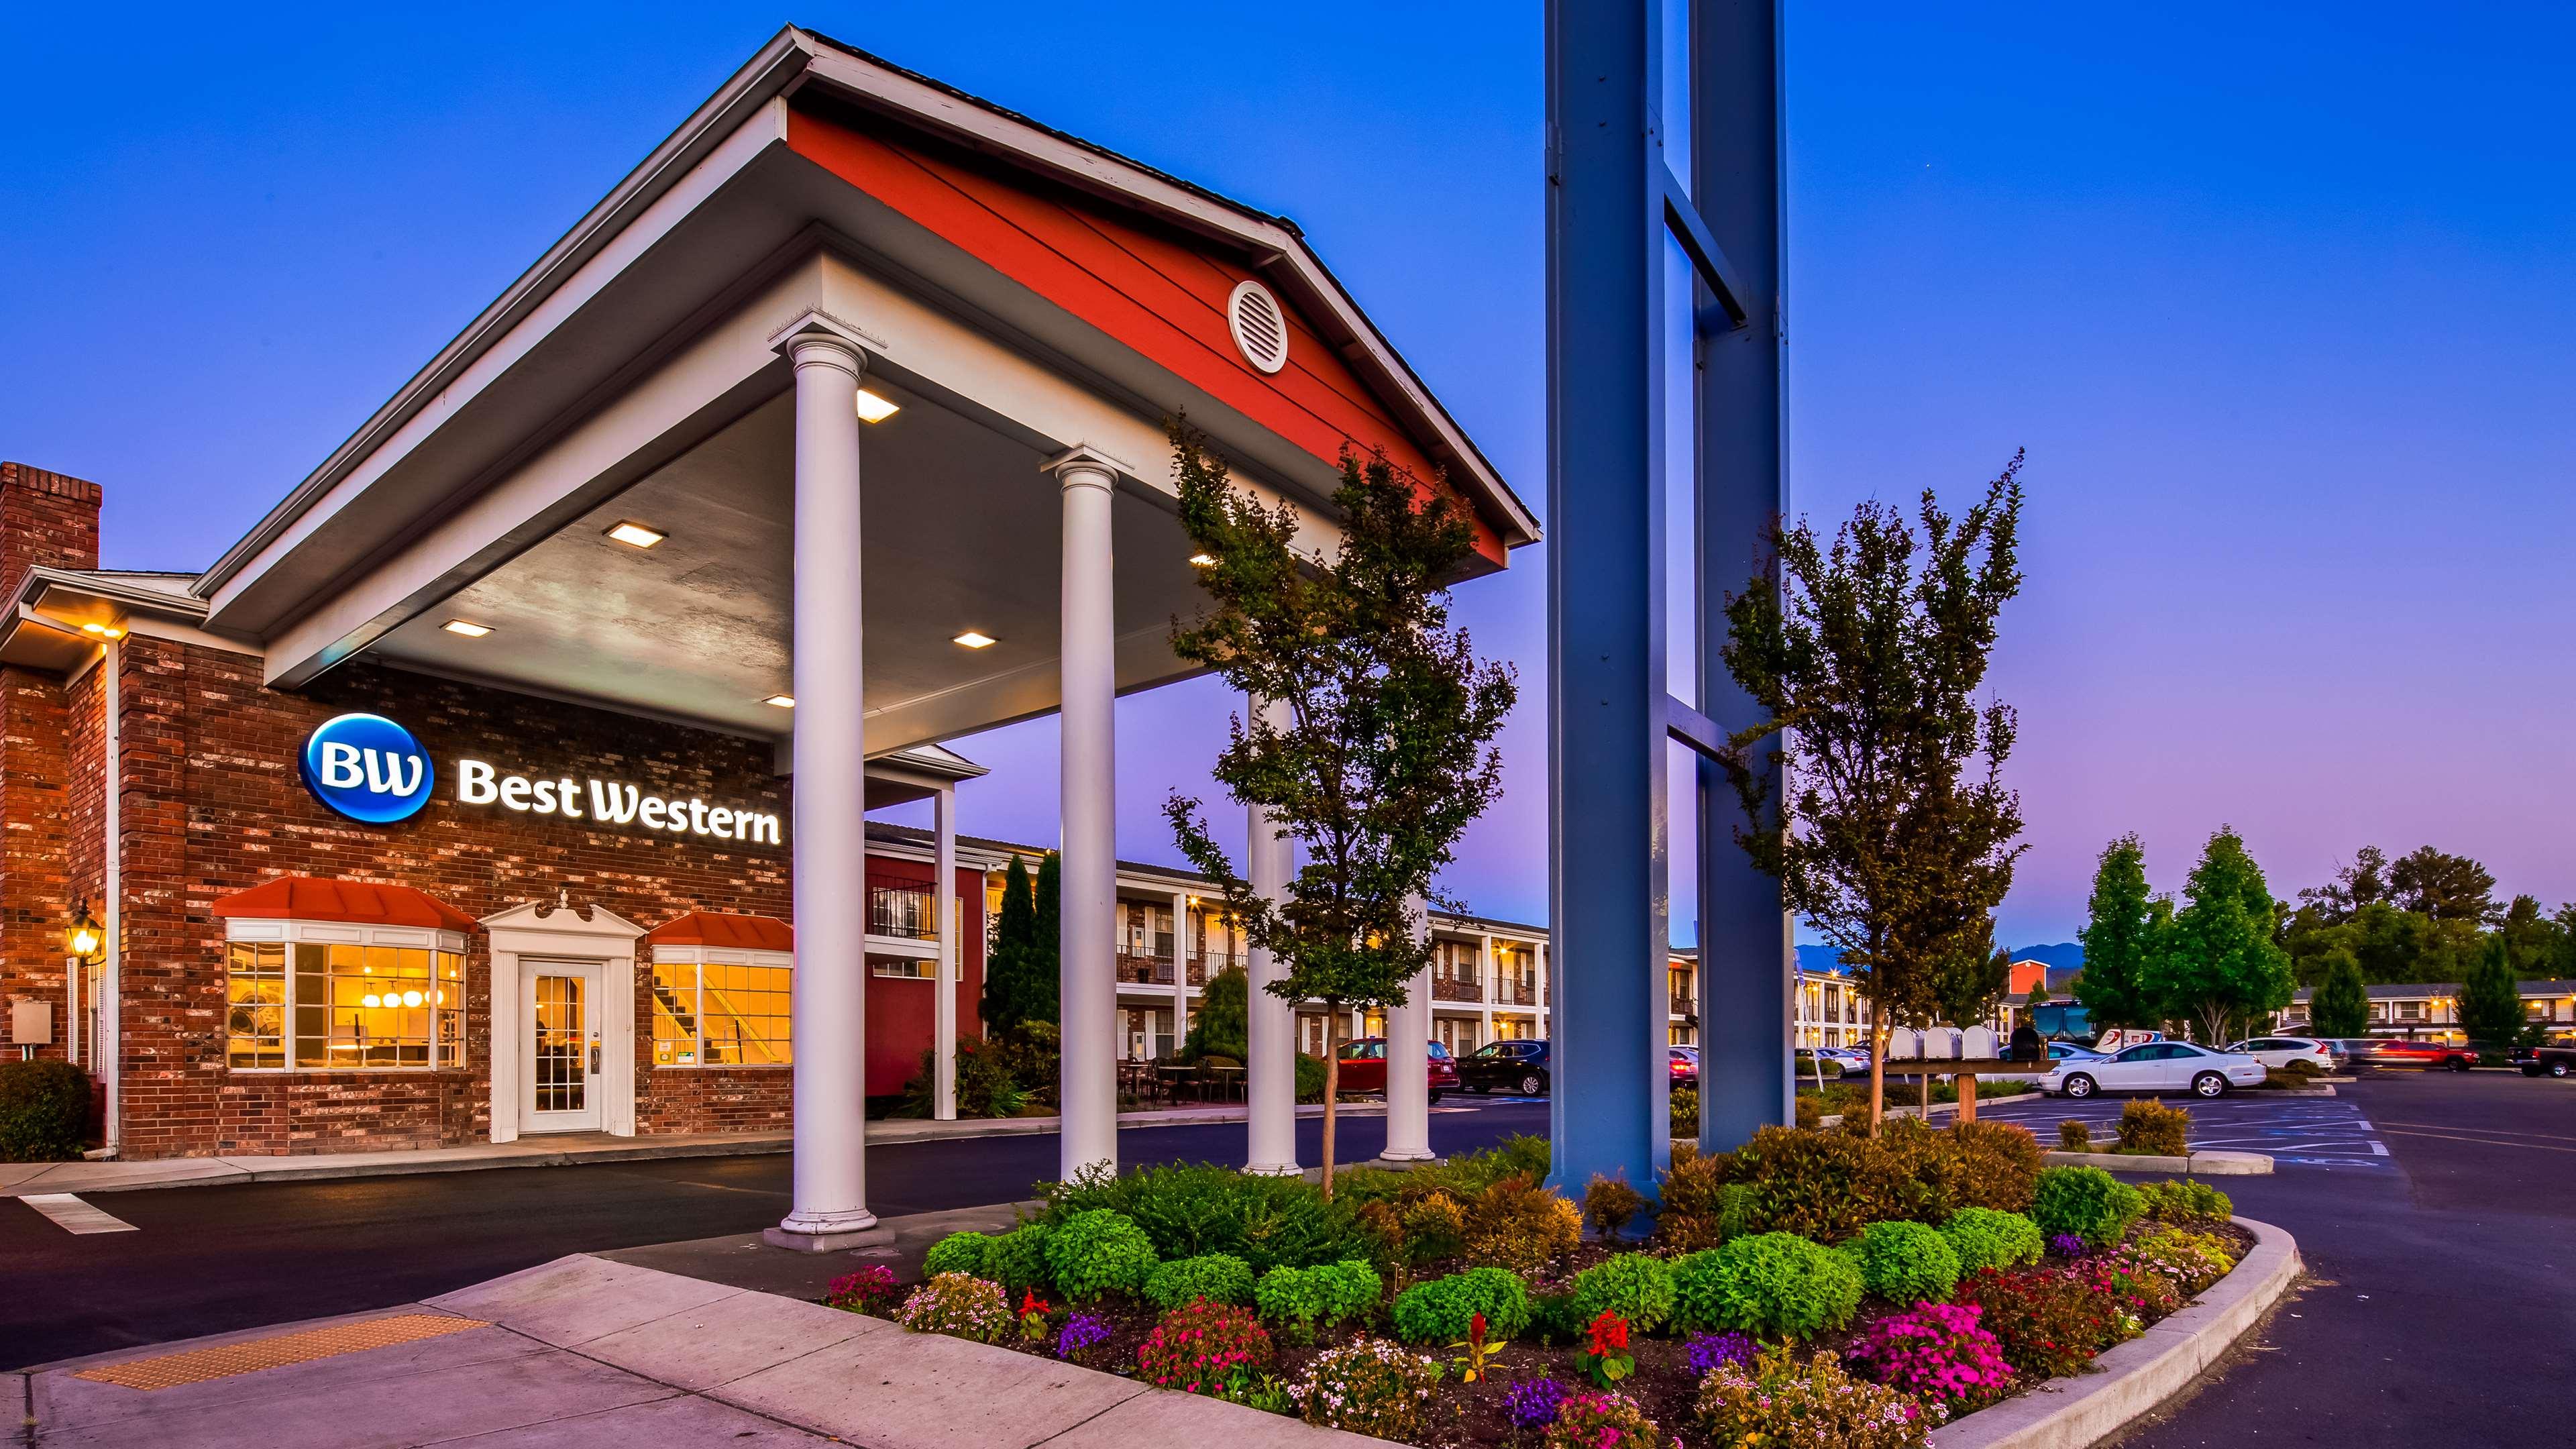 Best Western Horizon Inn image 3